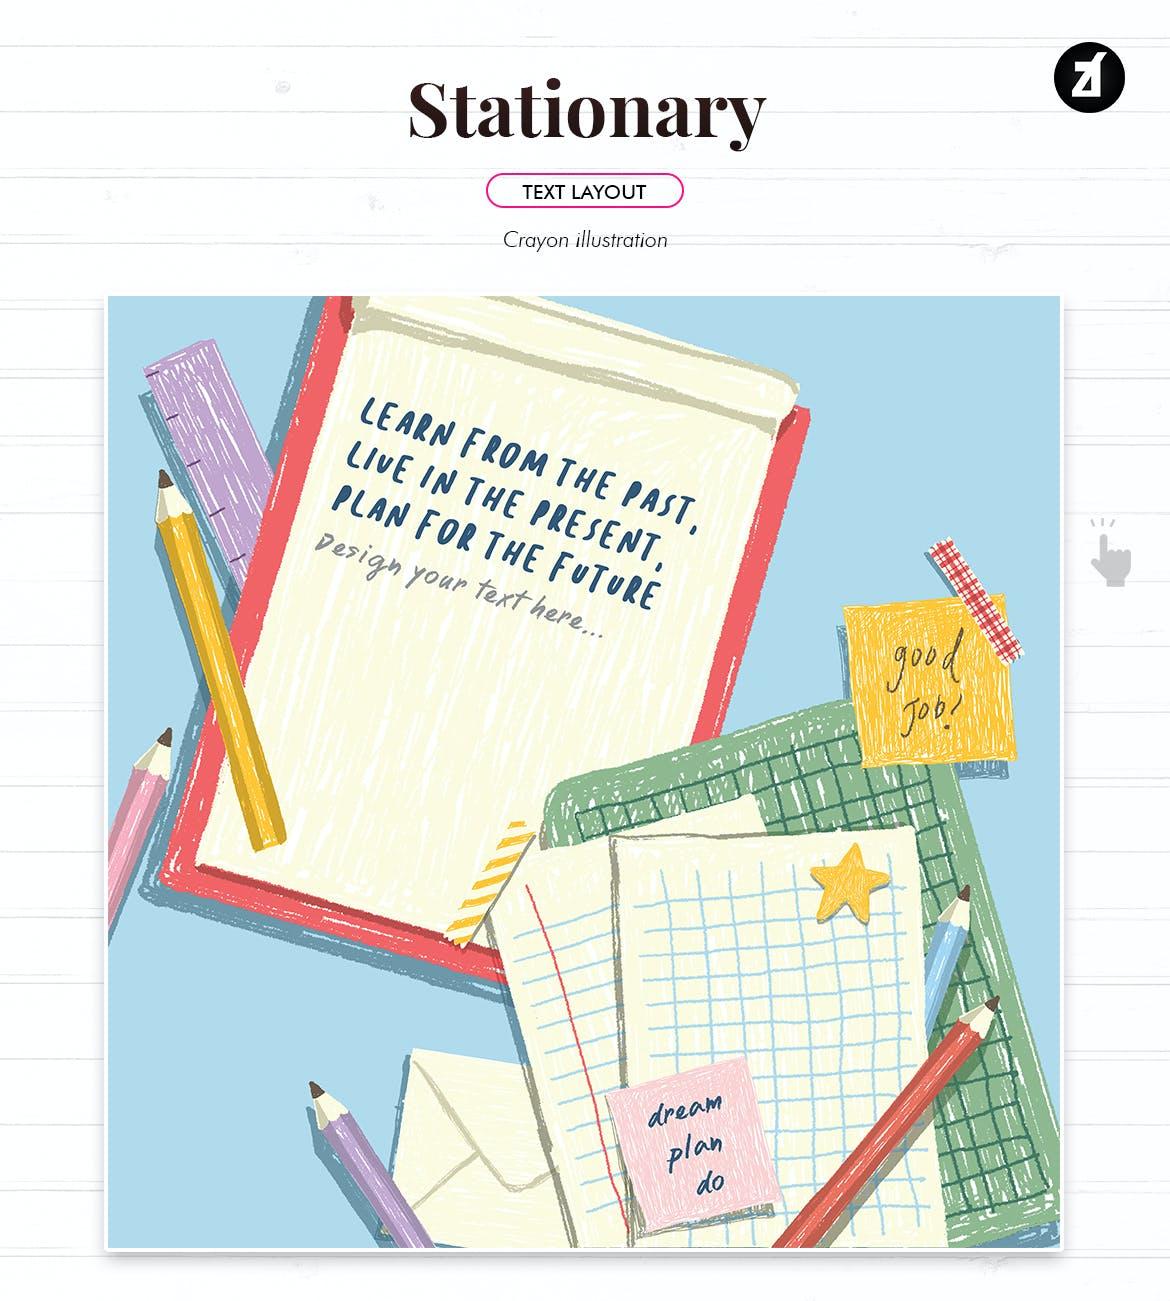 蜡笔绘画效果矢量背景设计素材 Stationary Illustration With Text Layout插图3